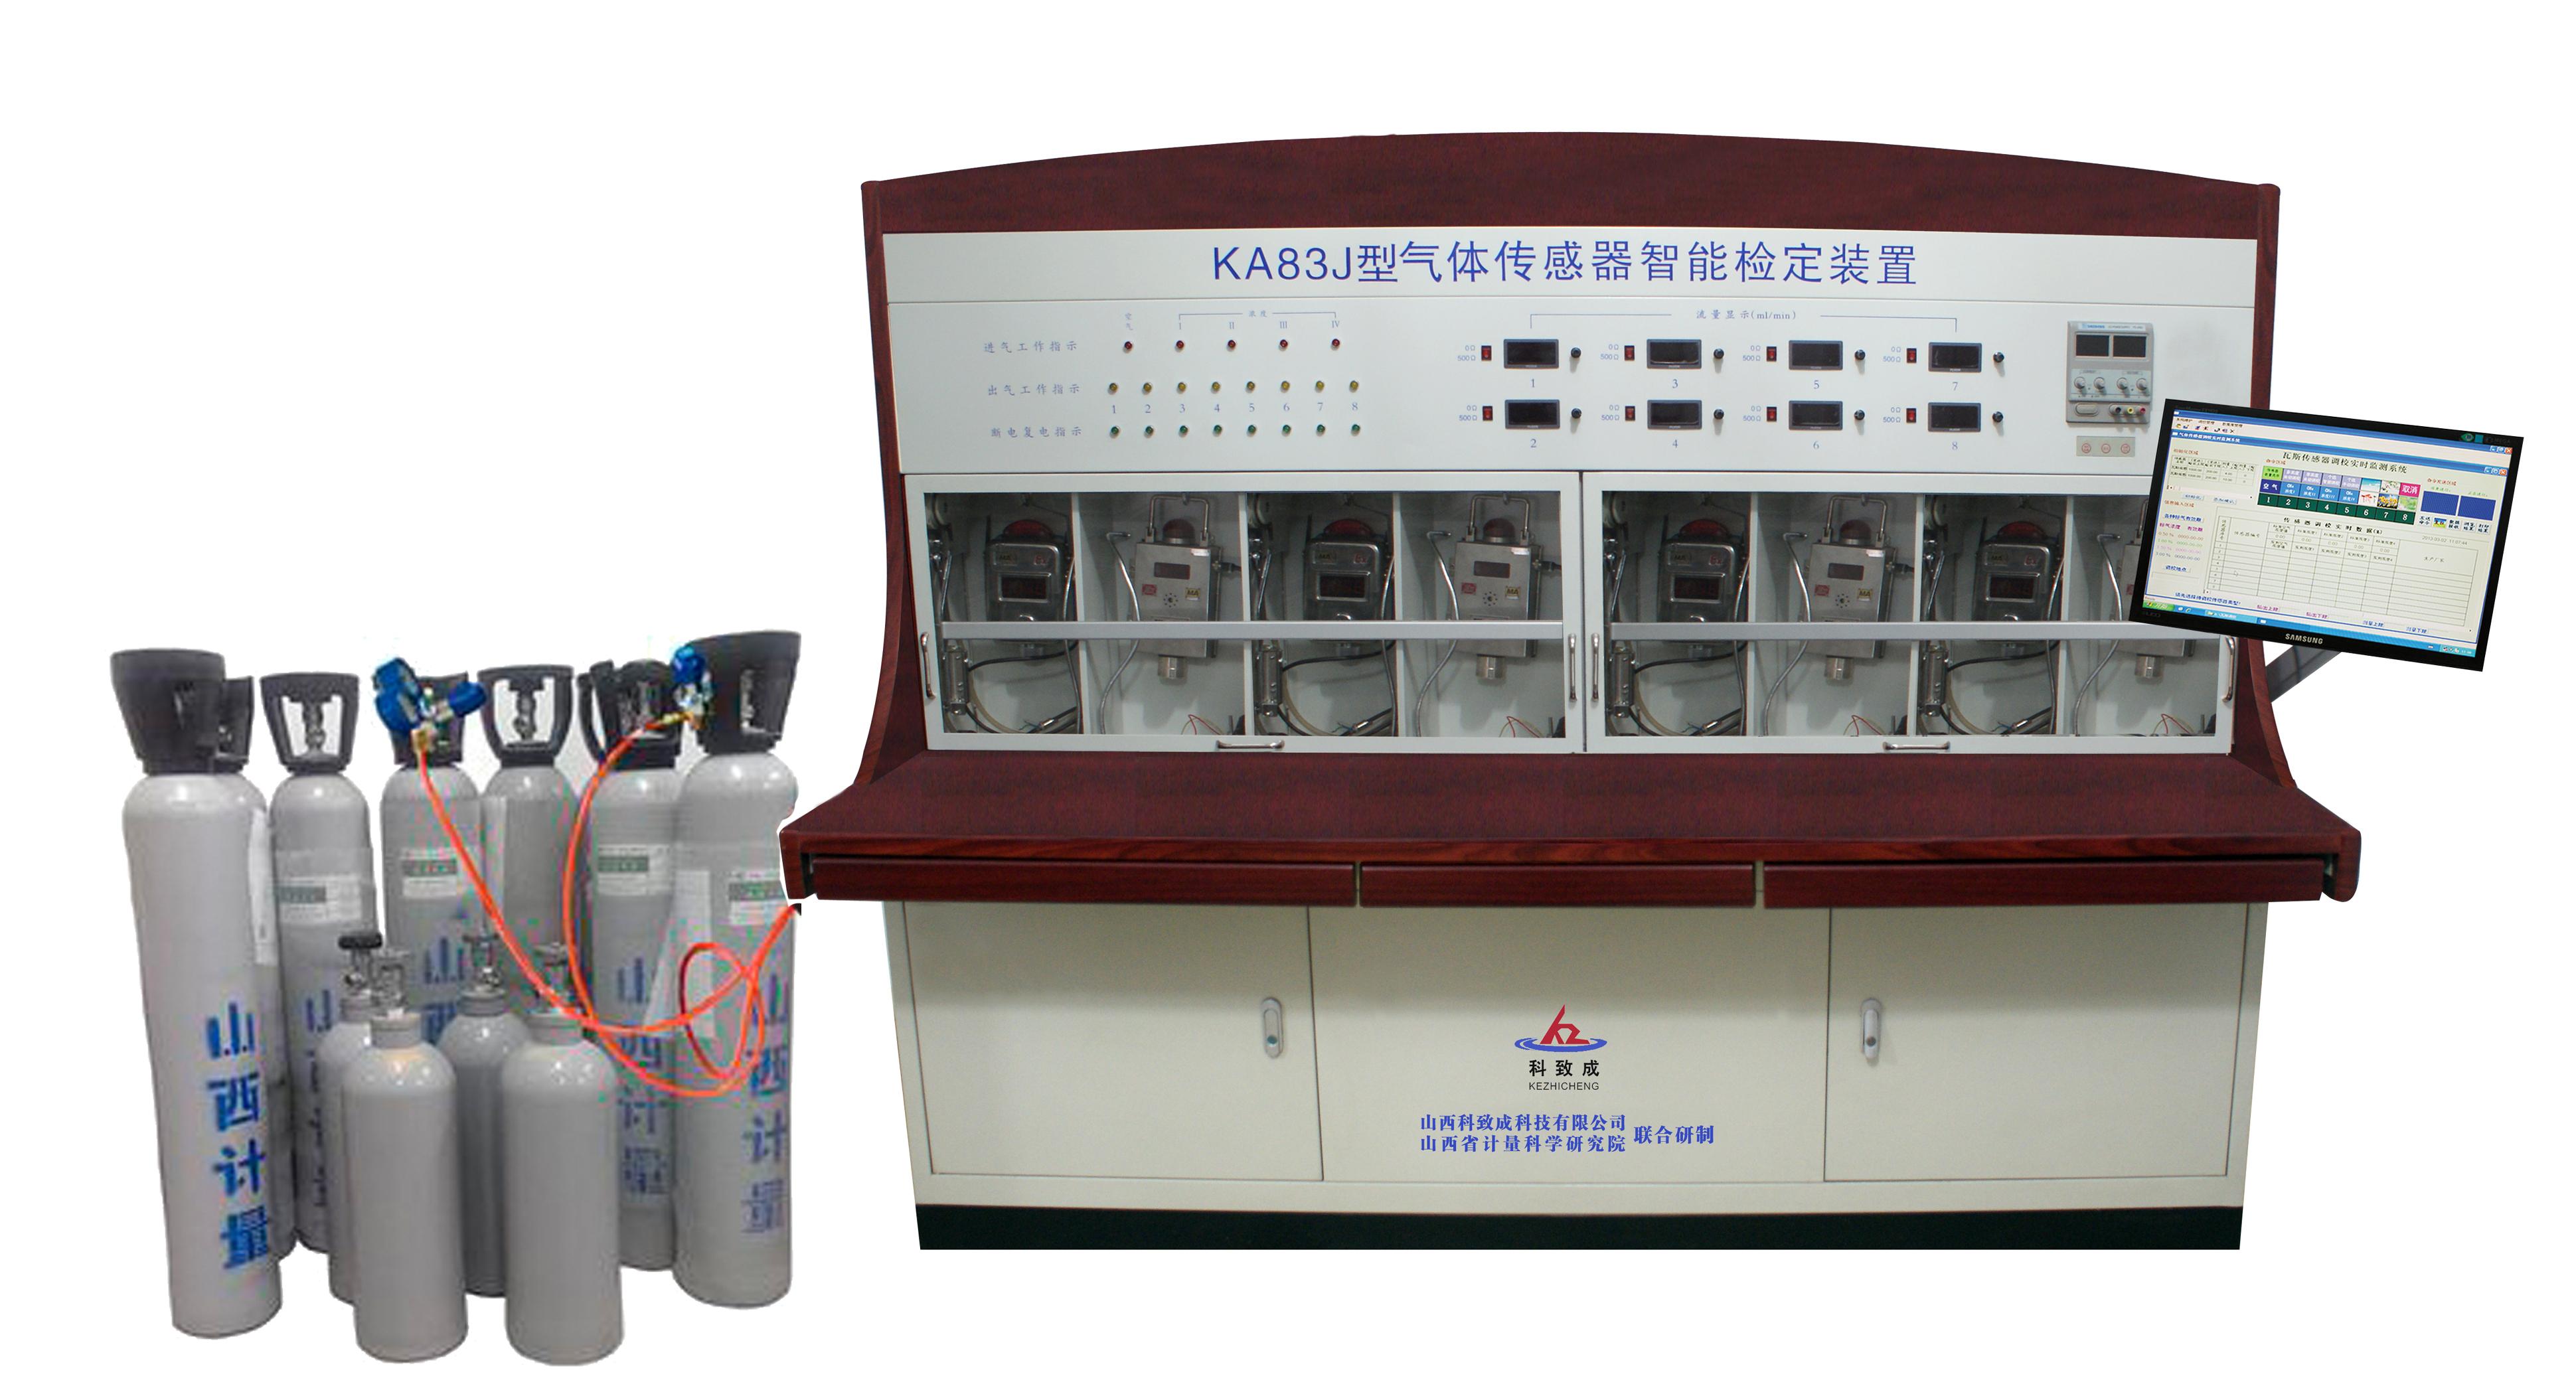 KA83J型气体传感器智能检定装置he1